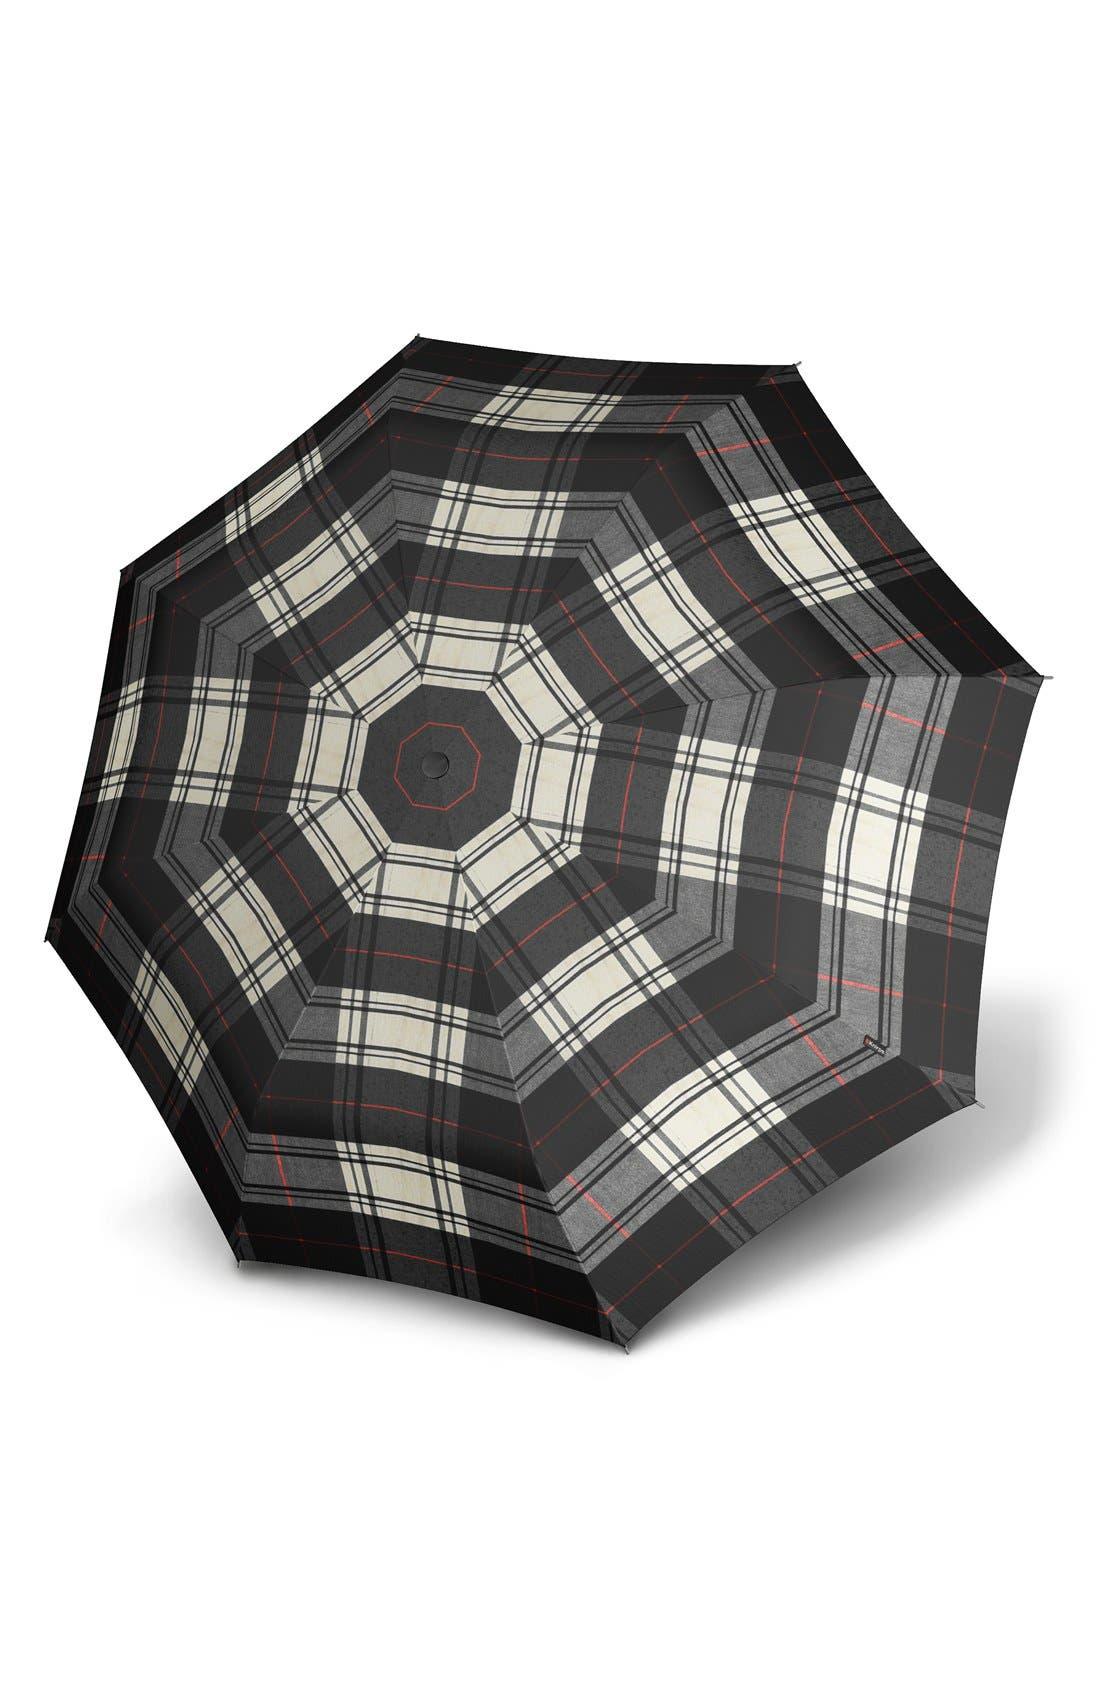 Main Image - Knirps 'Duomatic' Umbrella